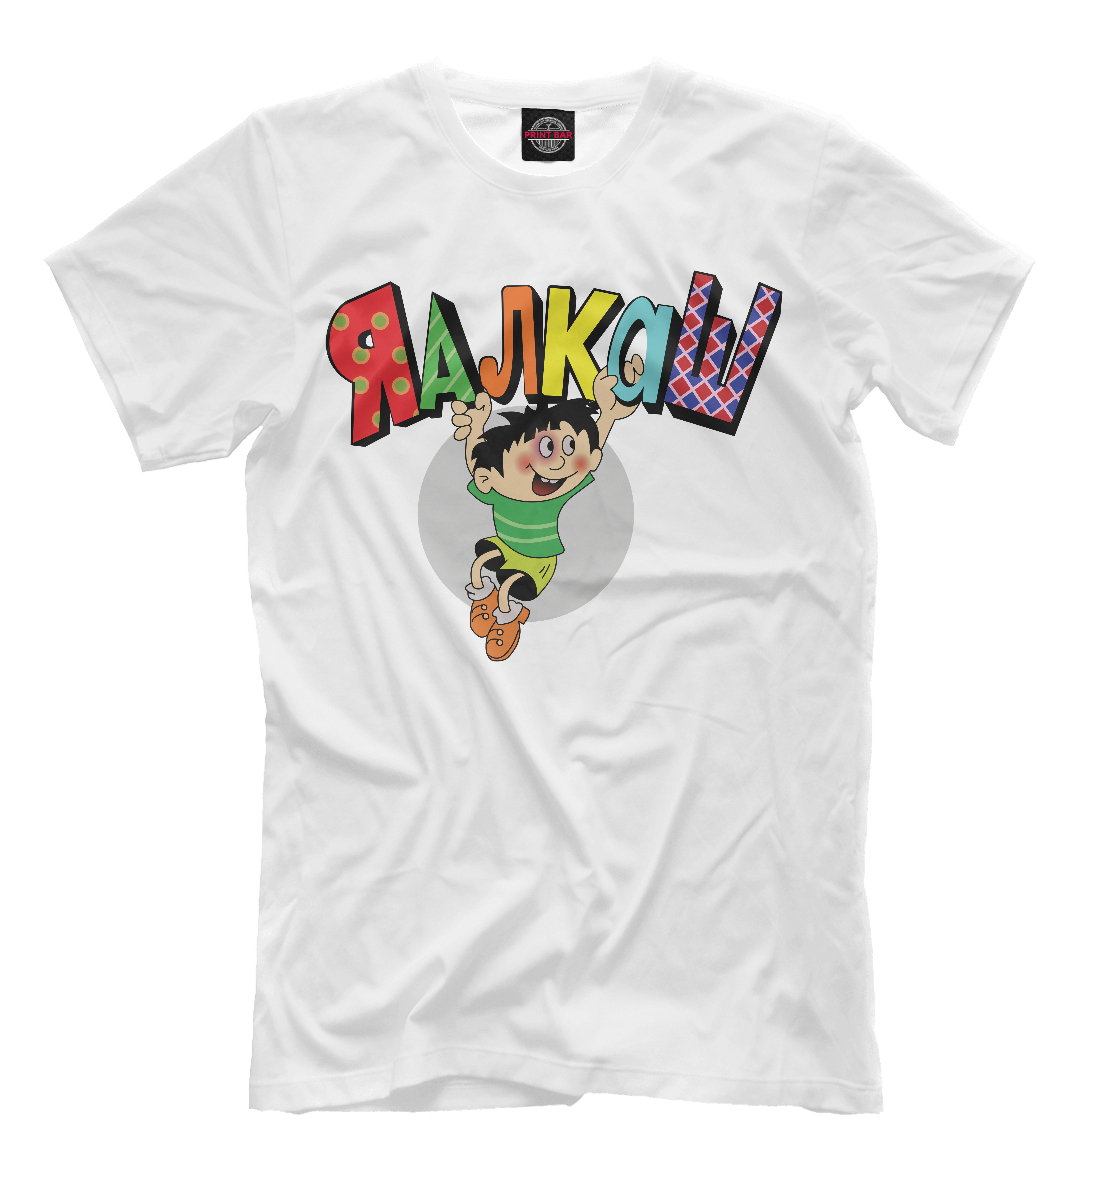 Men's T Shirt I алкаш